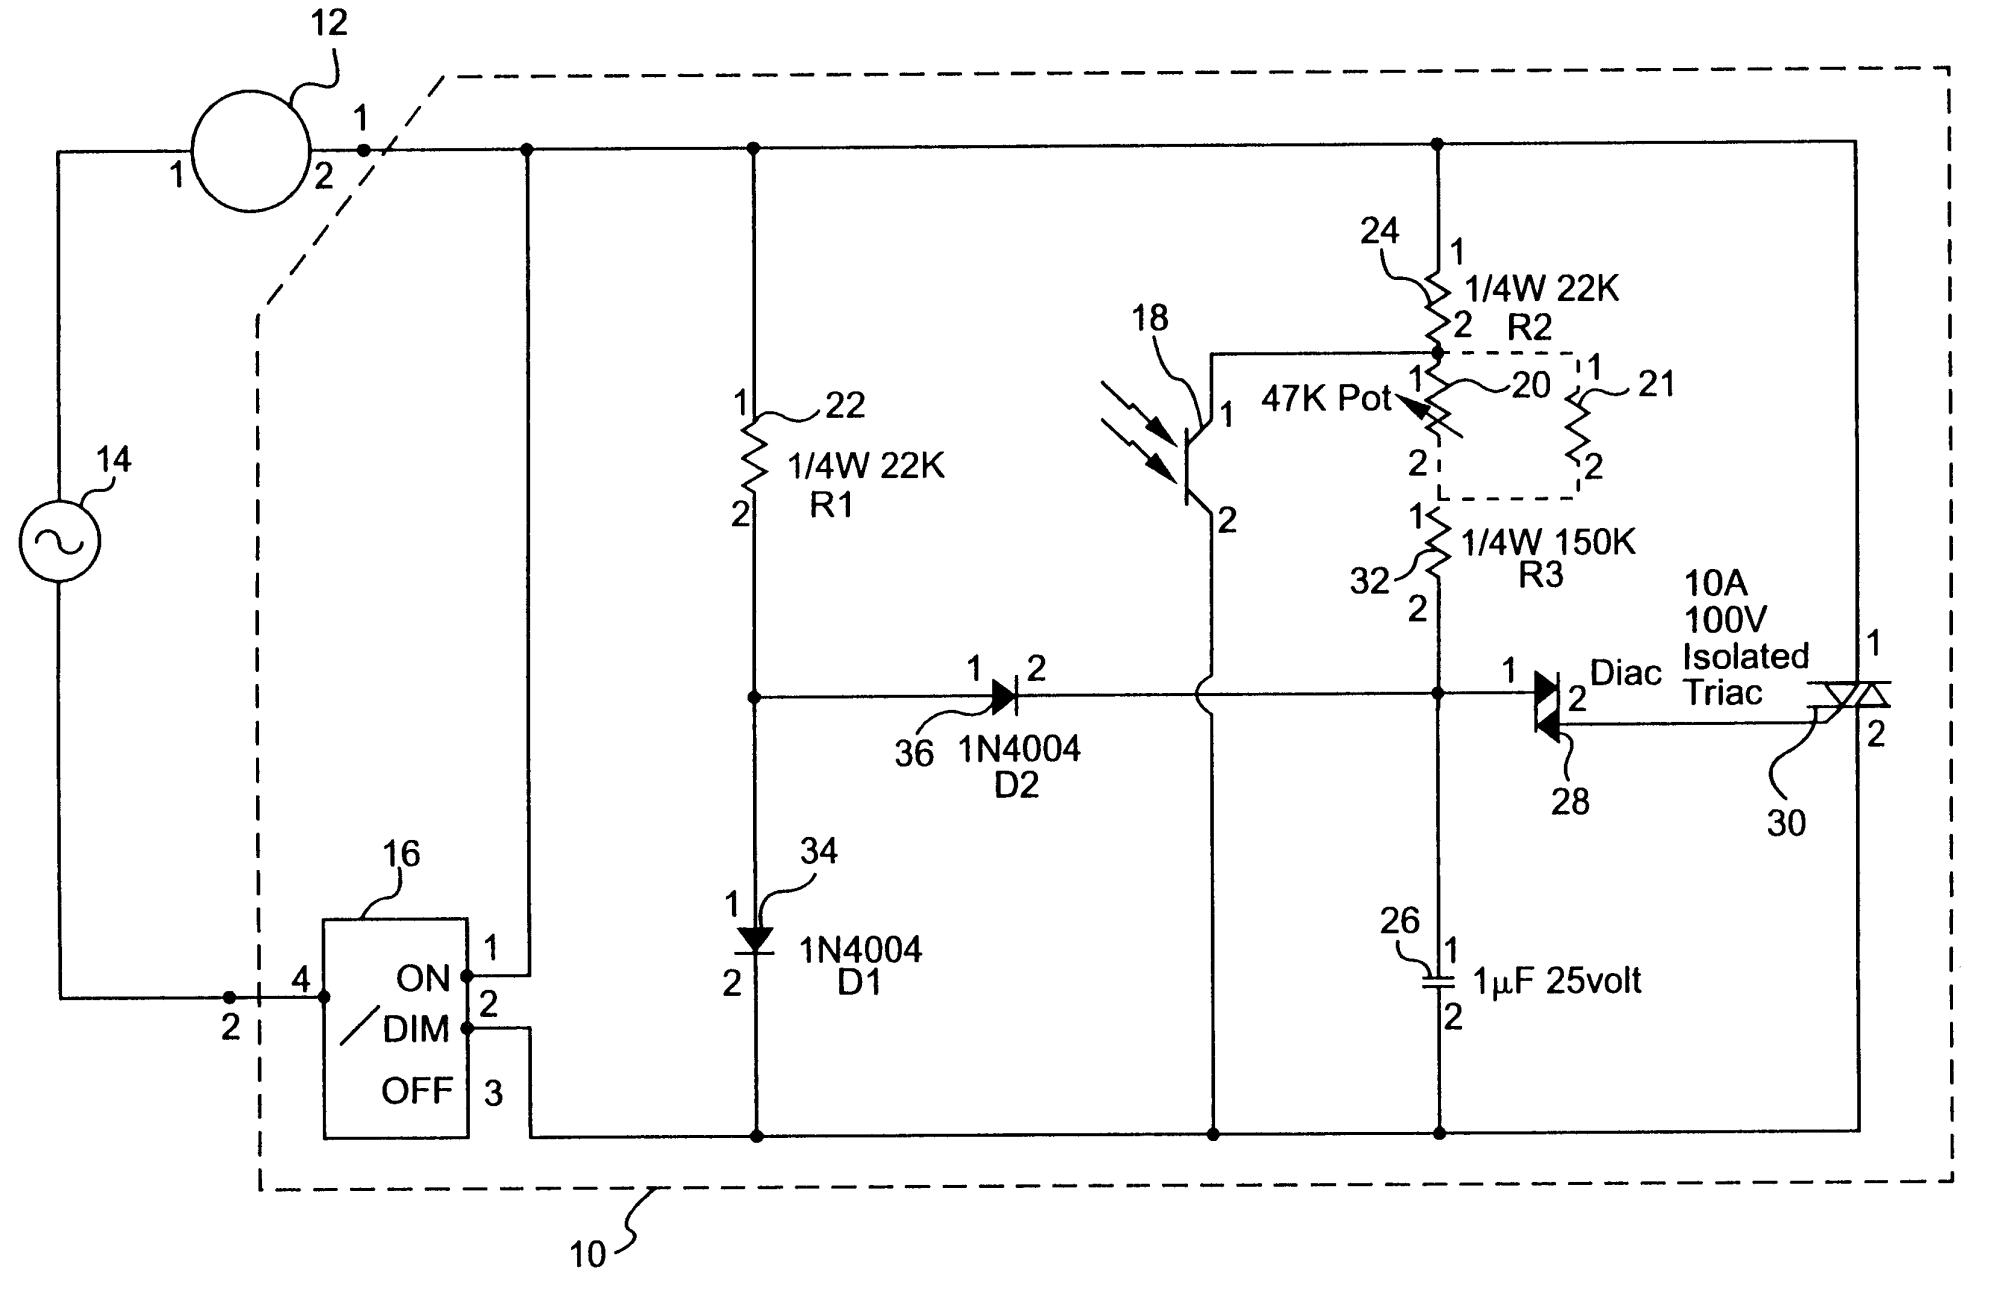 hight resolution of ceiling fan wiring diagram pdf